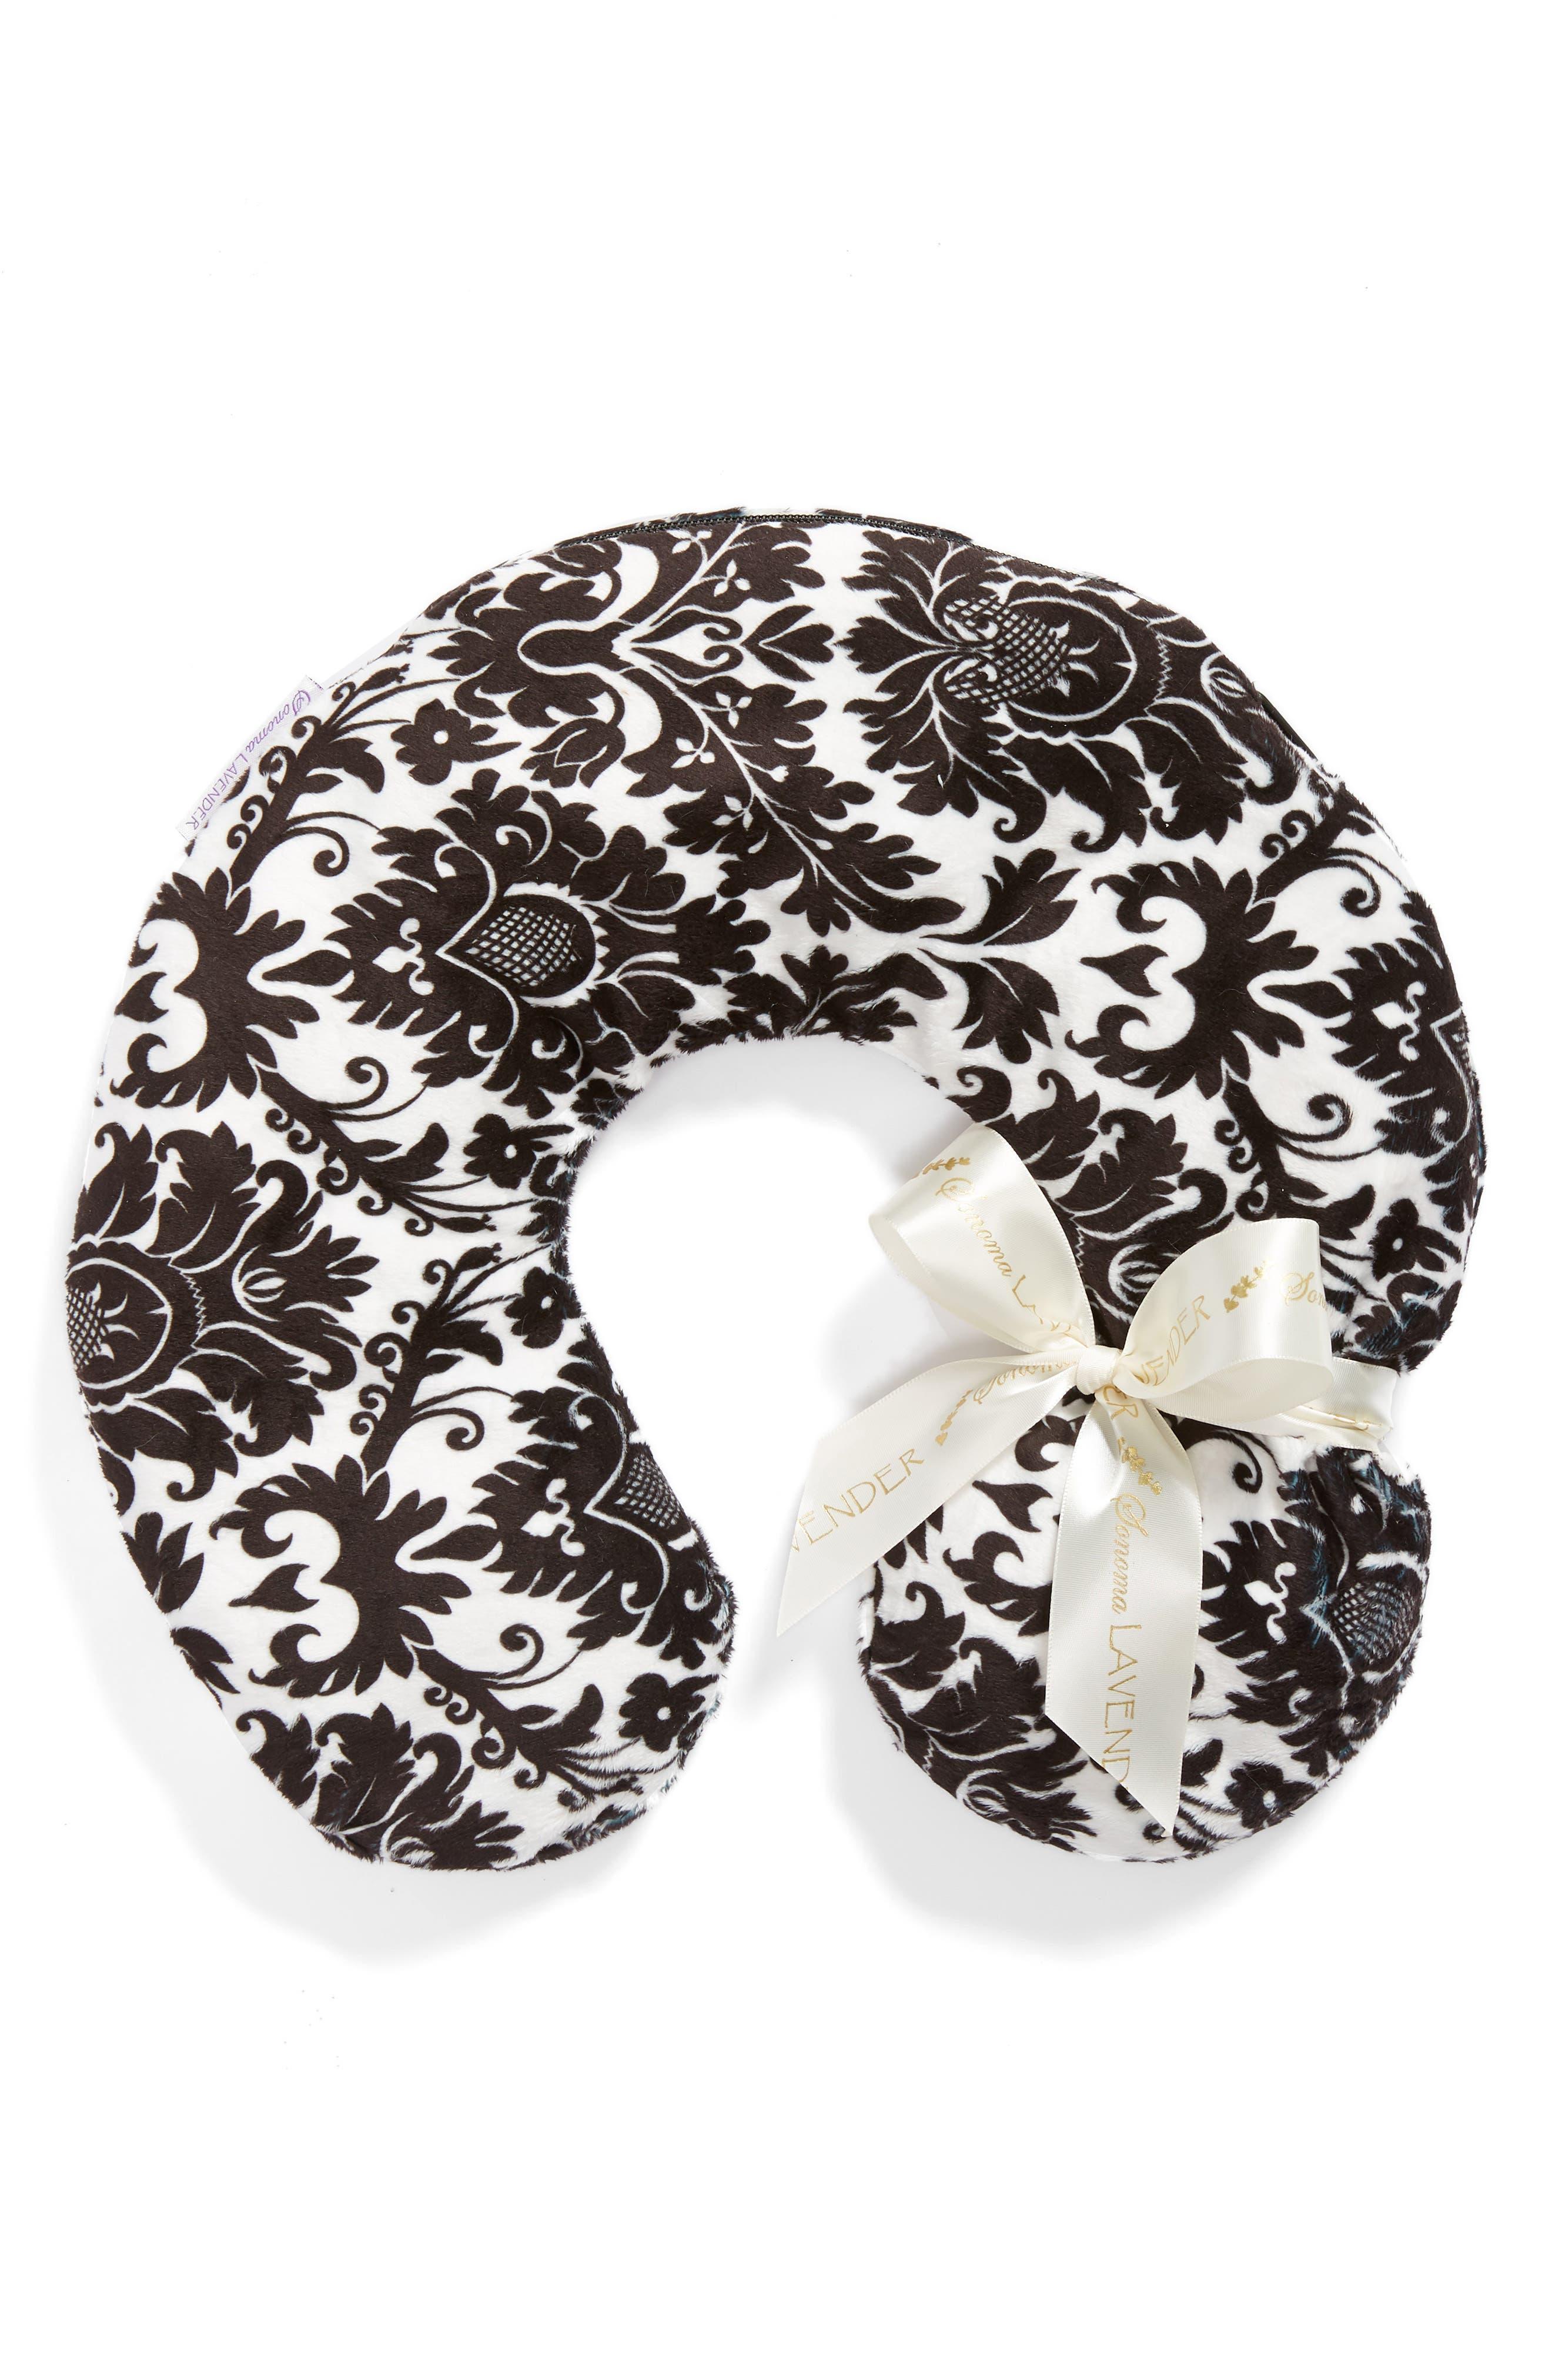 Sonoma Lavender Black Damask Neck Pillow (Limited Edition)